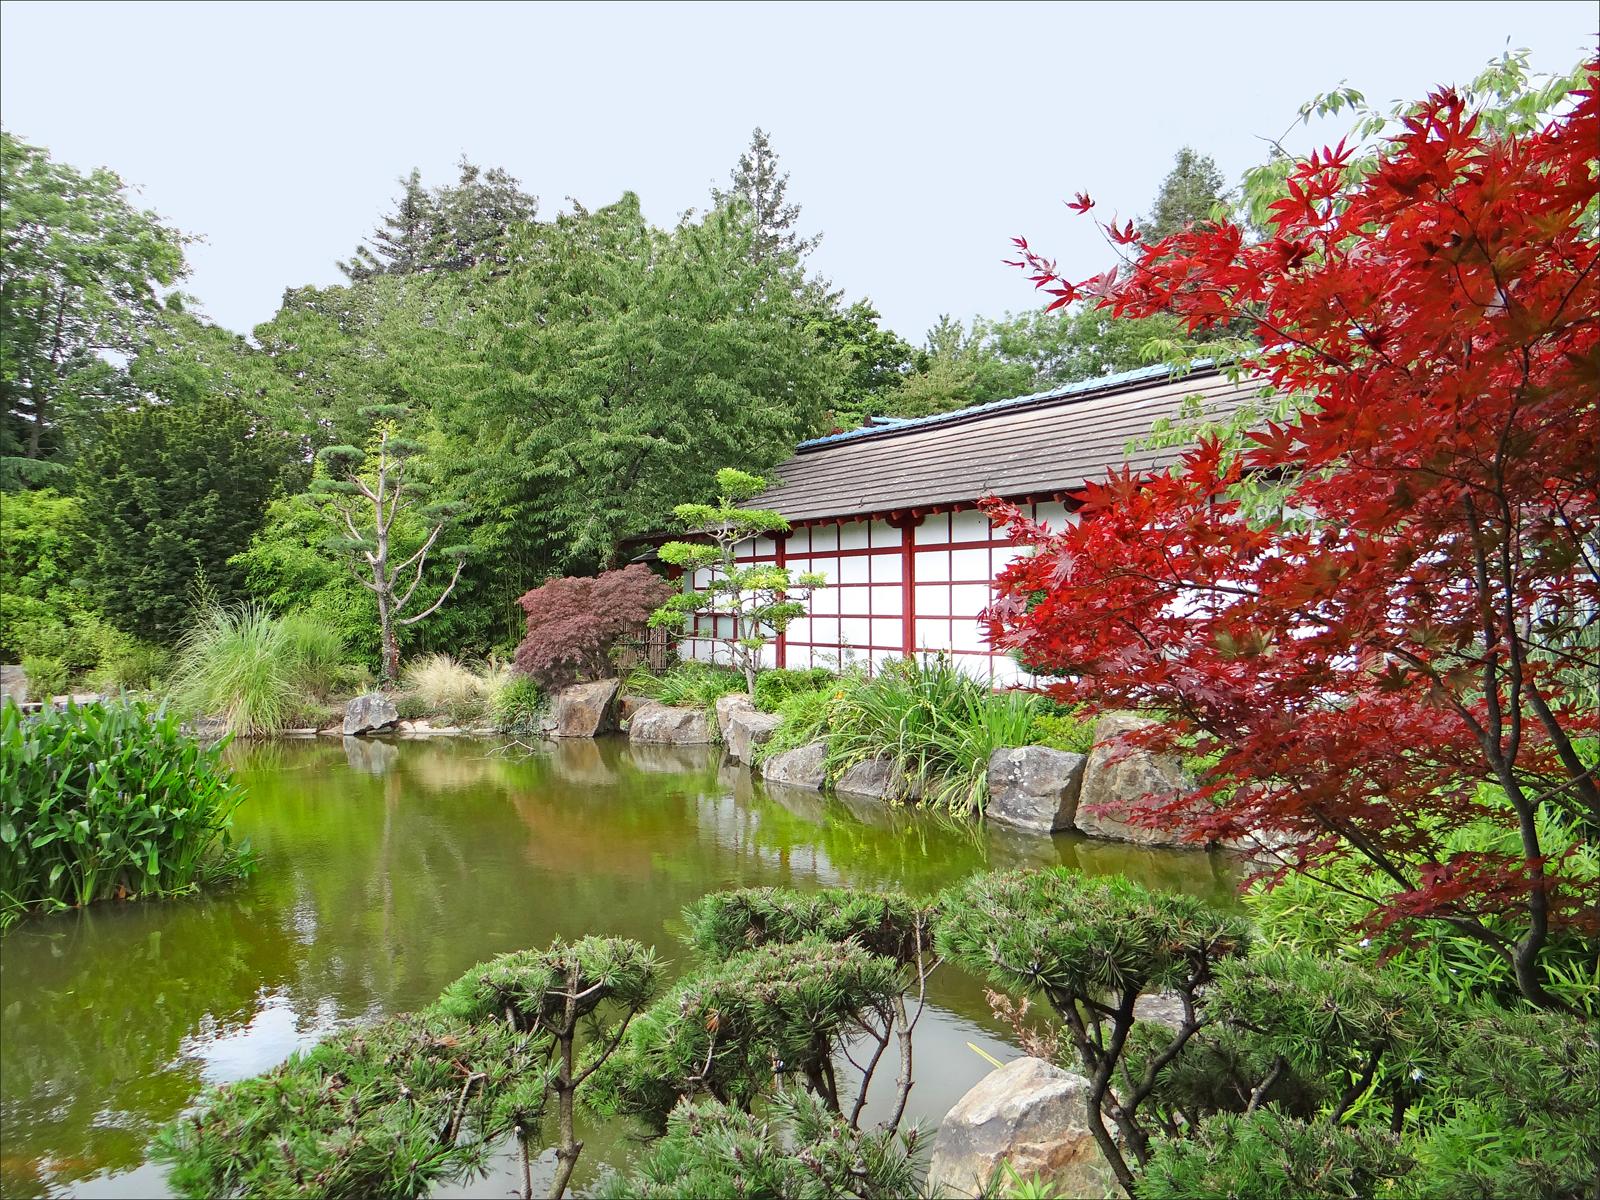 archivo le jardin japonais le de versailles nantes jpg wikipedia la enciclopedia libre. Black Bedroom Furniture Sets. Home Design Ideas